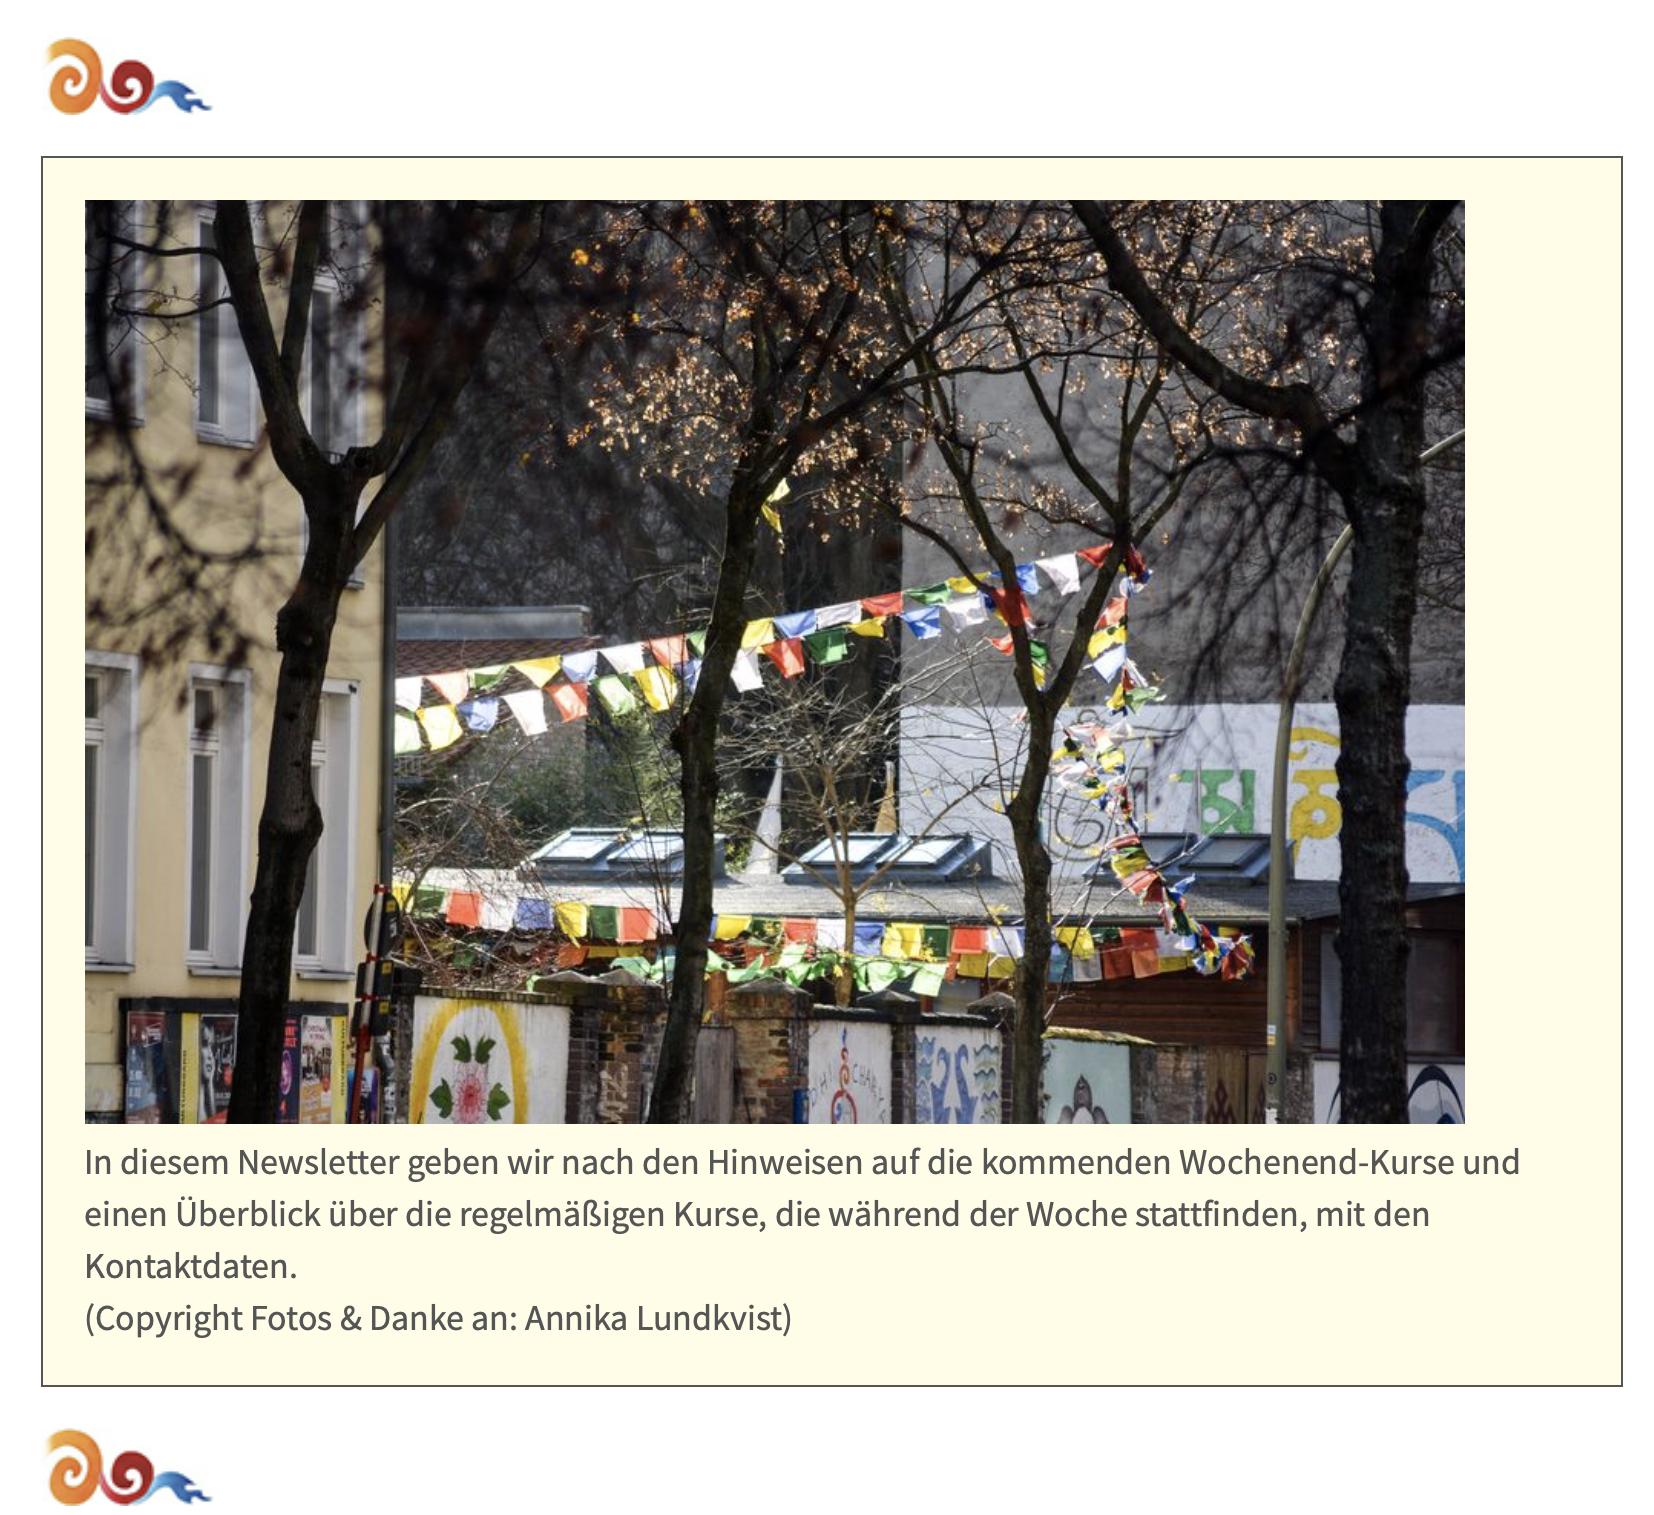 Bodhicharya Berlin Website & January 2020 Newsletter